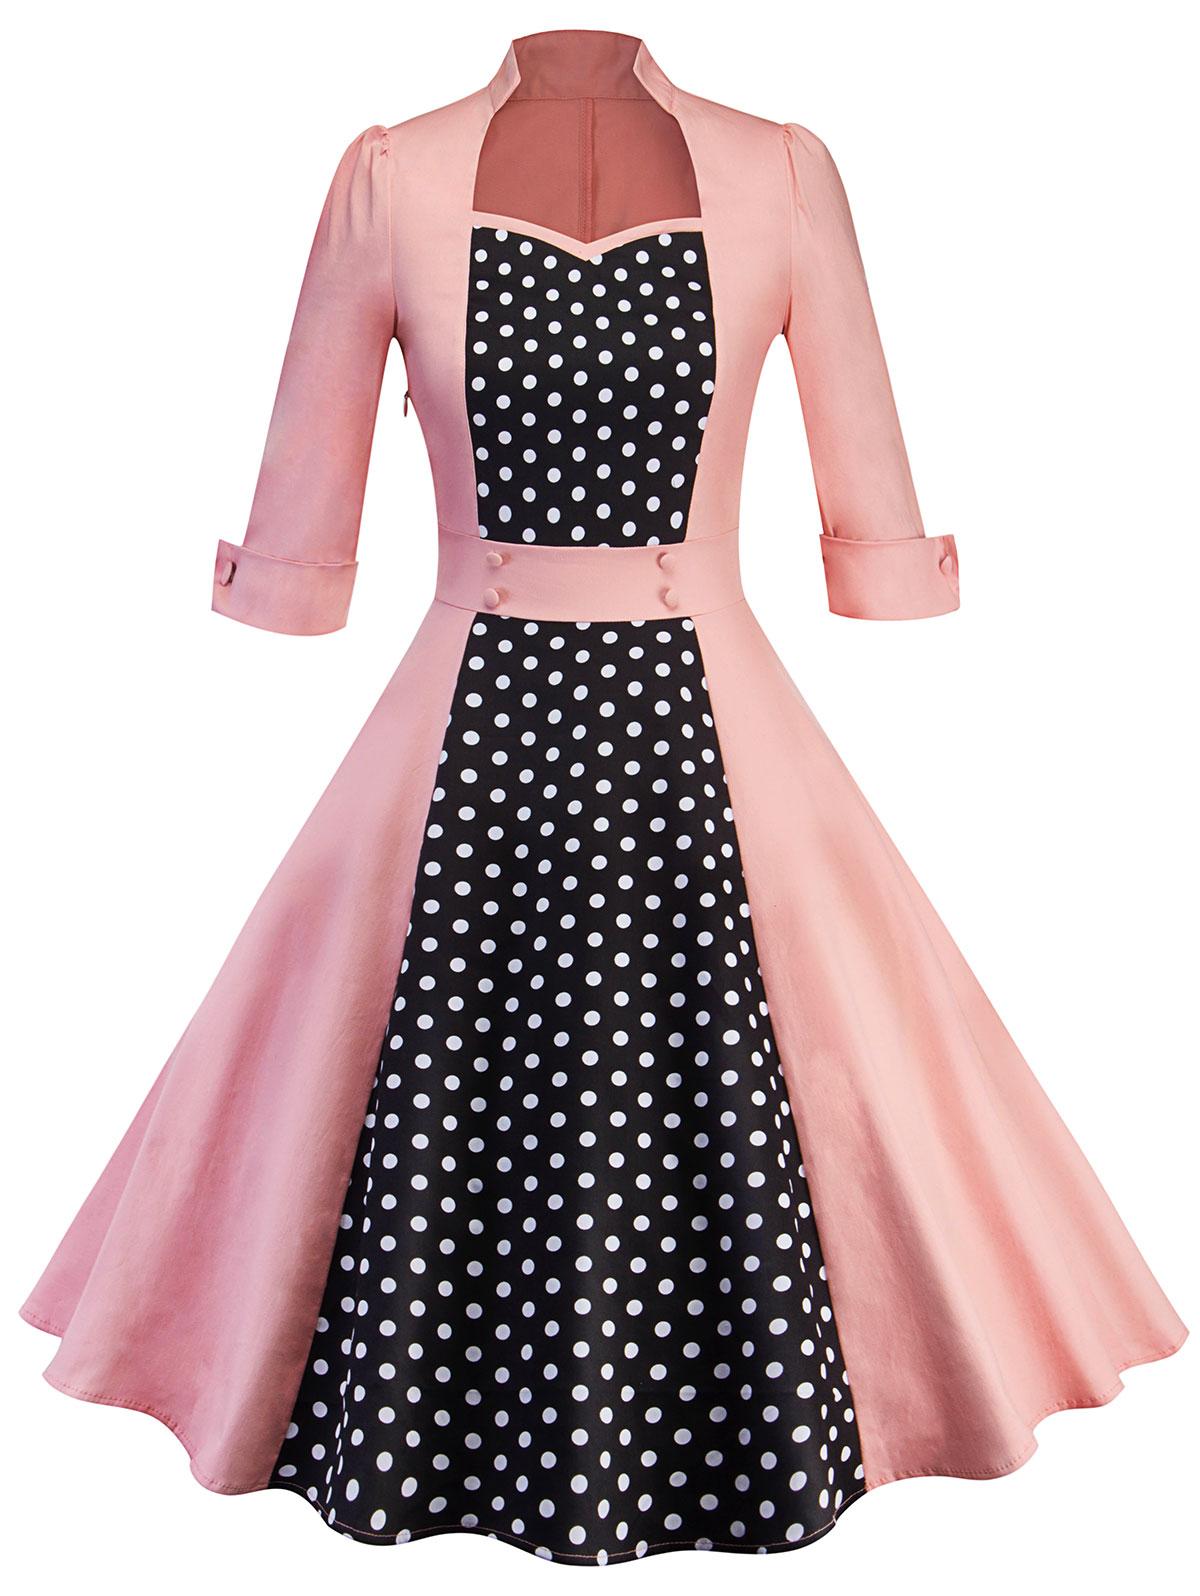 Fashion Polka Dot Print Women Vintage Dress 1960s Audrey Hepburn Retro Dress Elegant Sweetheart Neck 3/4 Sleeve Vestidos Платье